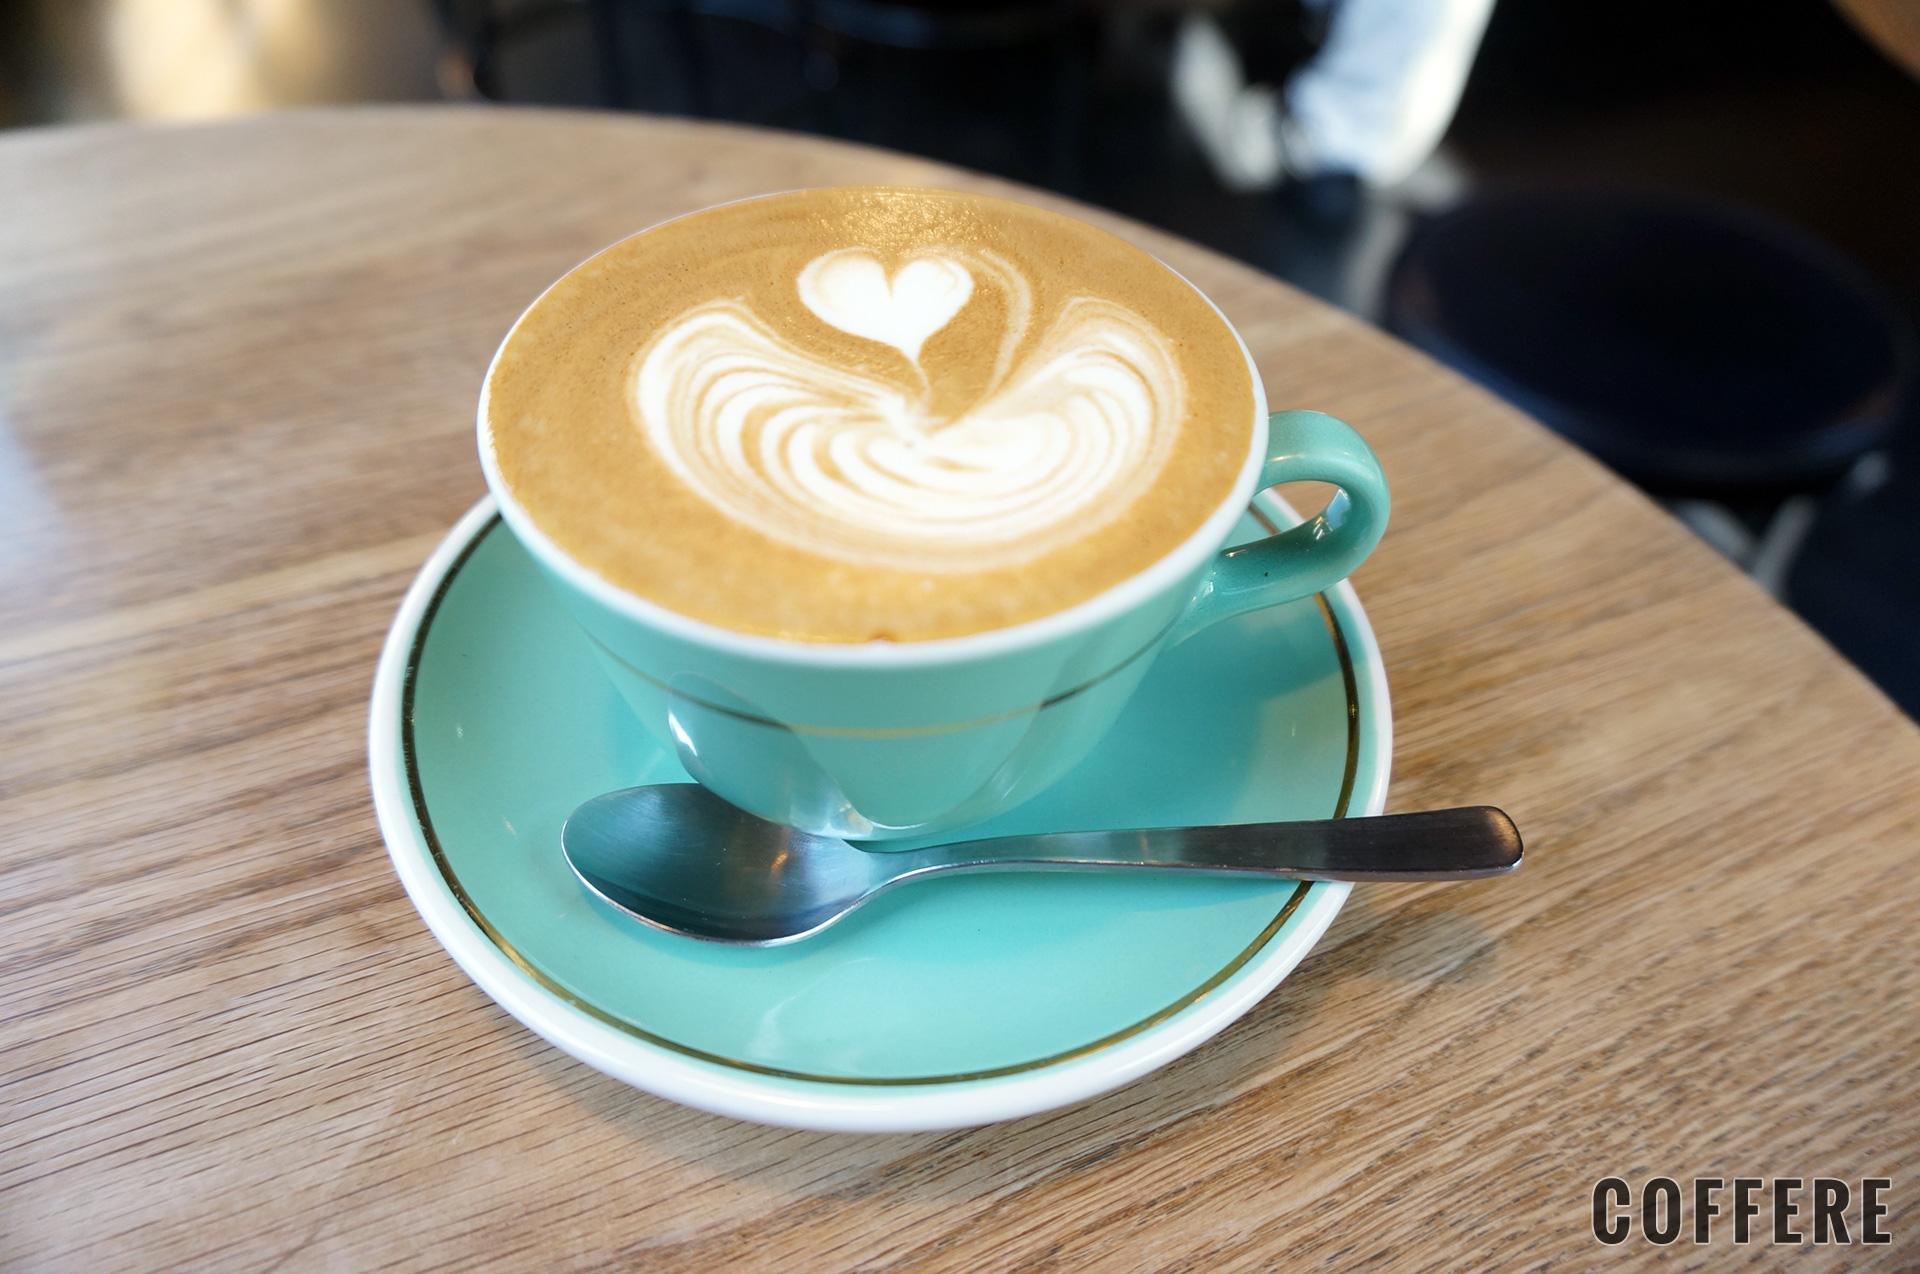 MOJO COFFEE 神楽坂のフラットホワイト